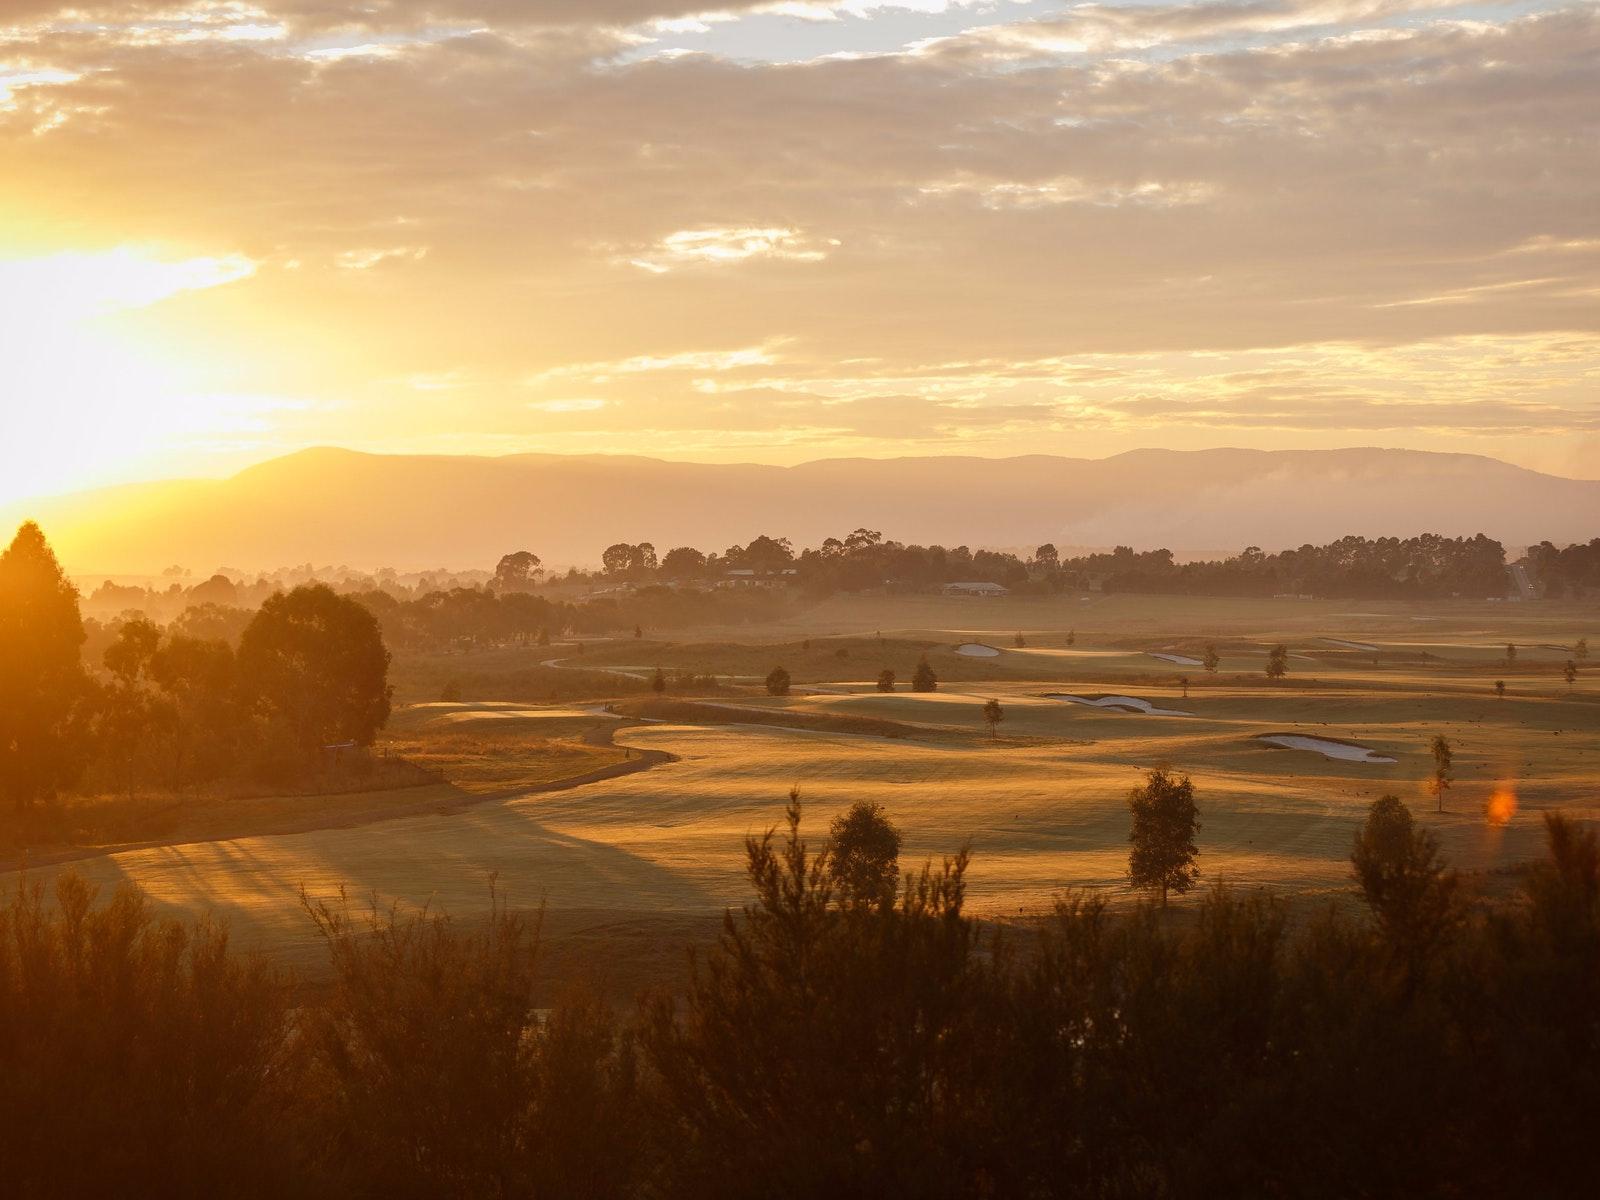 golf yarra valley and dandenong ranges victoria australia. Black Bedroom Furniture Sets. Home Design Ideas